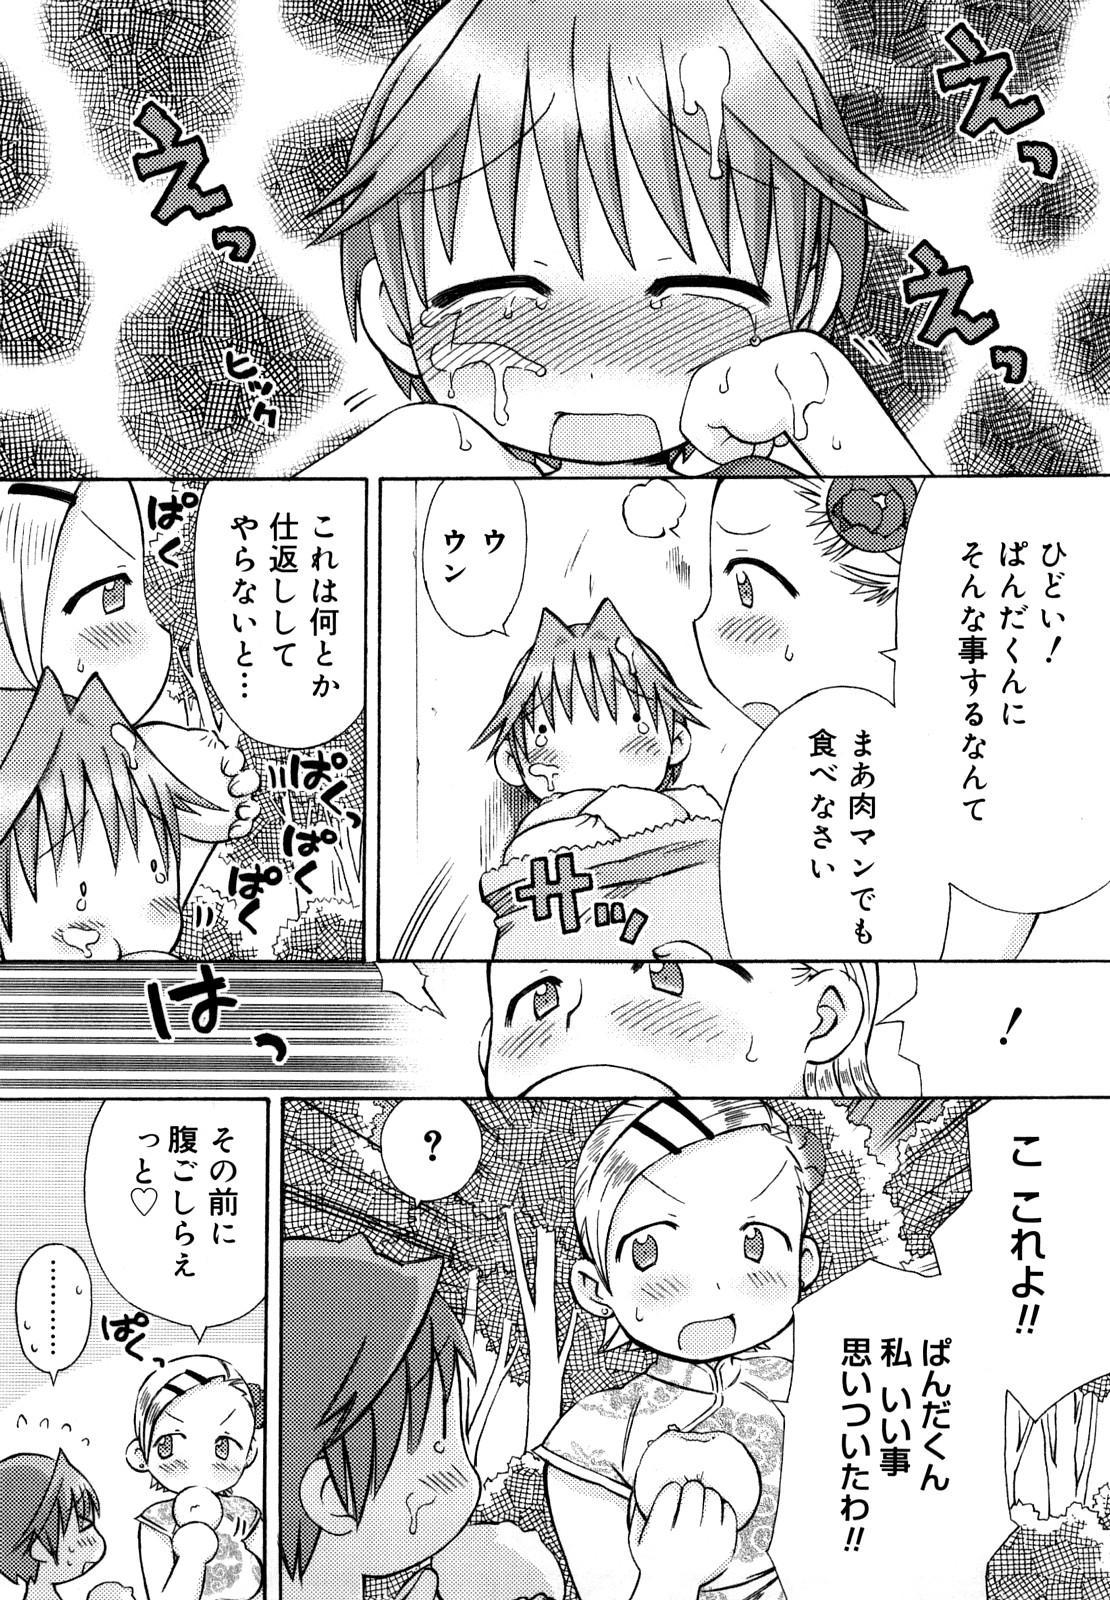 Hatsuden Pandakun! Shinsouban 77